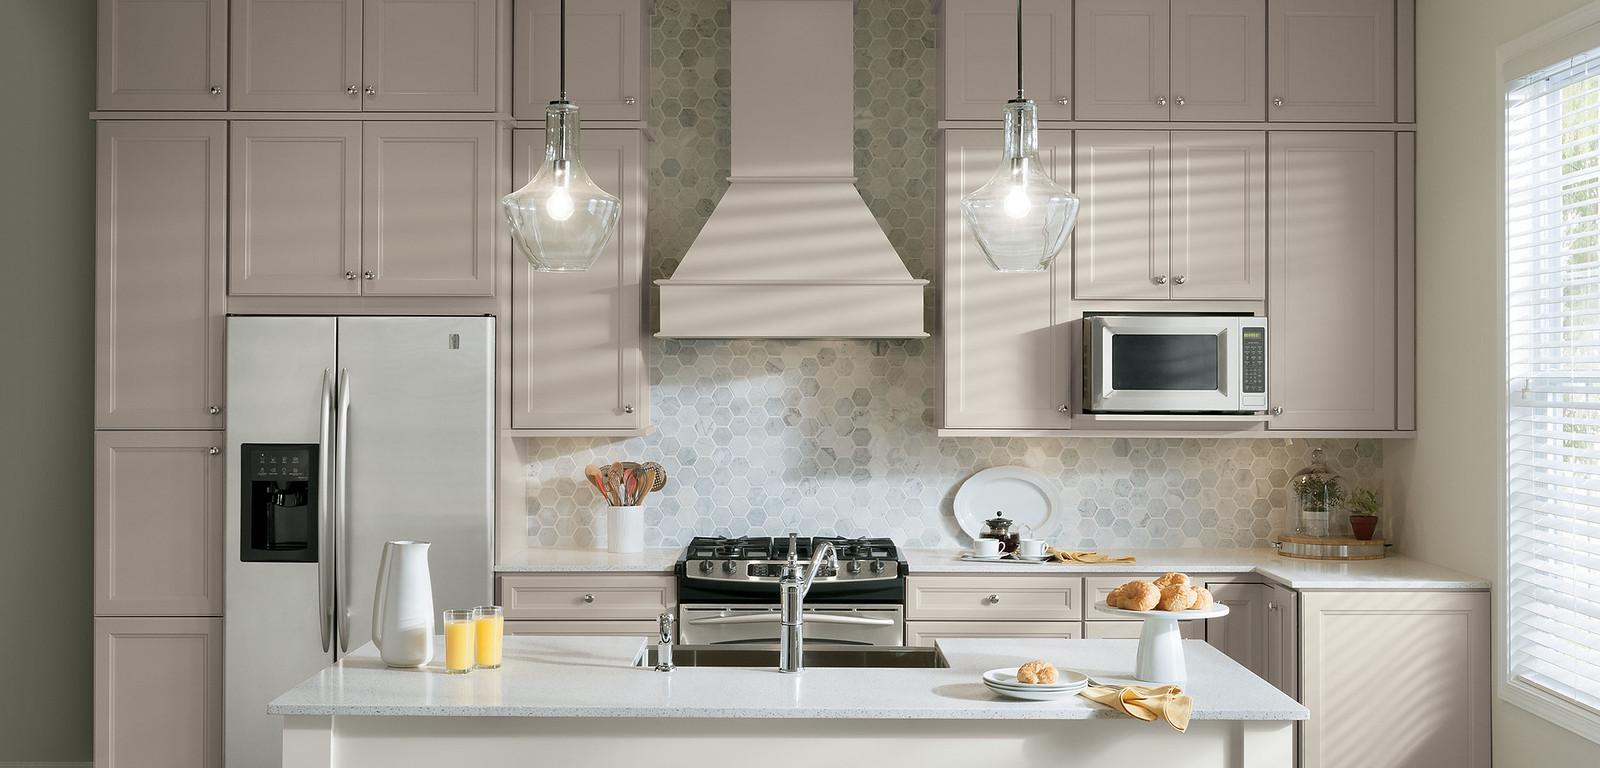 new remodeled kitchen in batavia ny